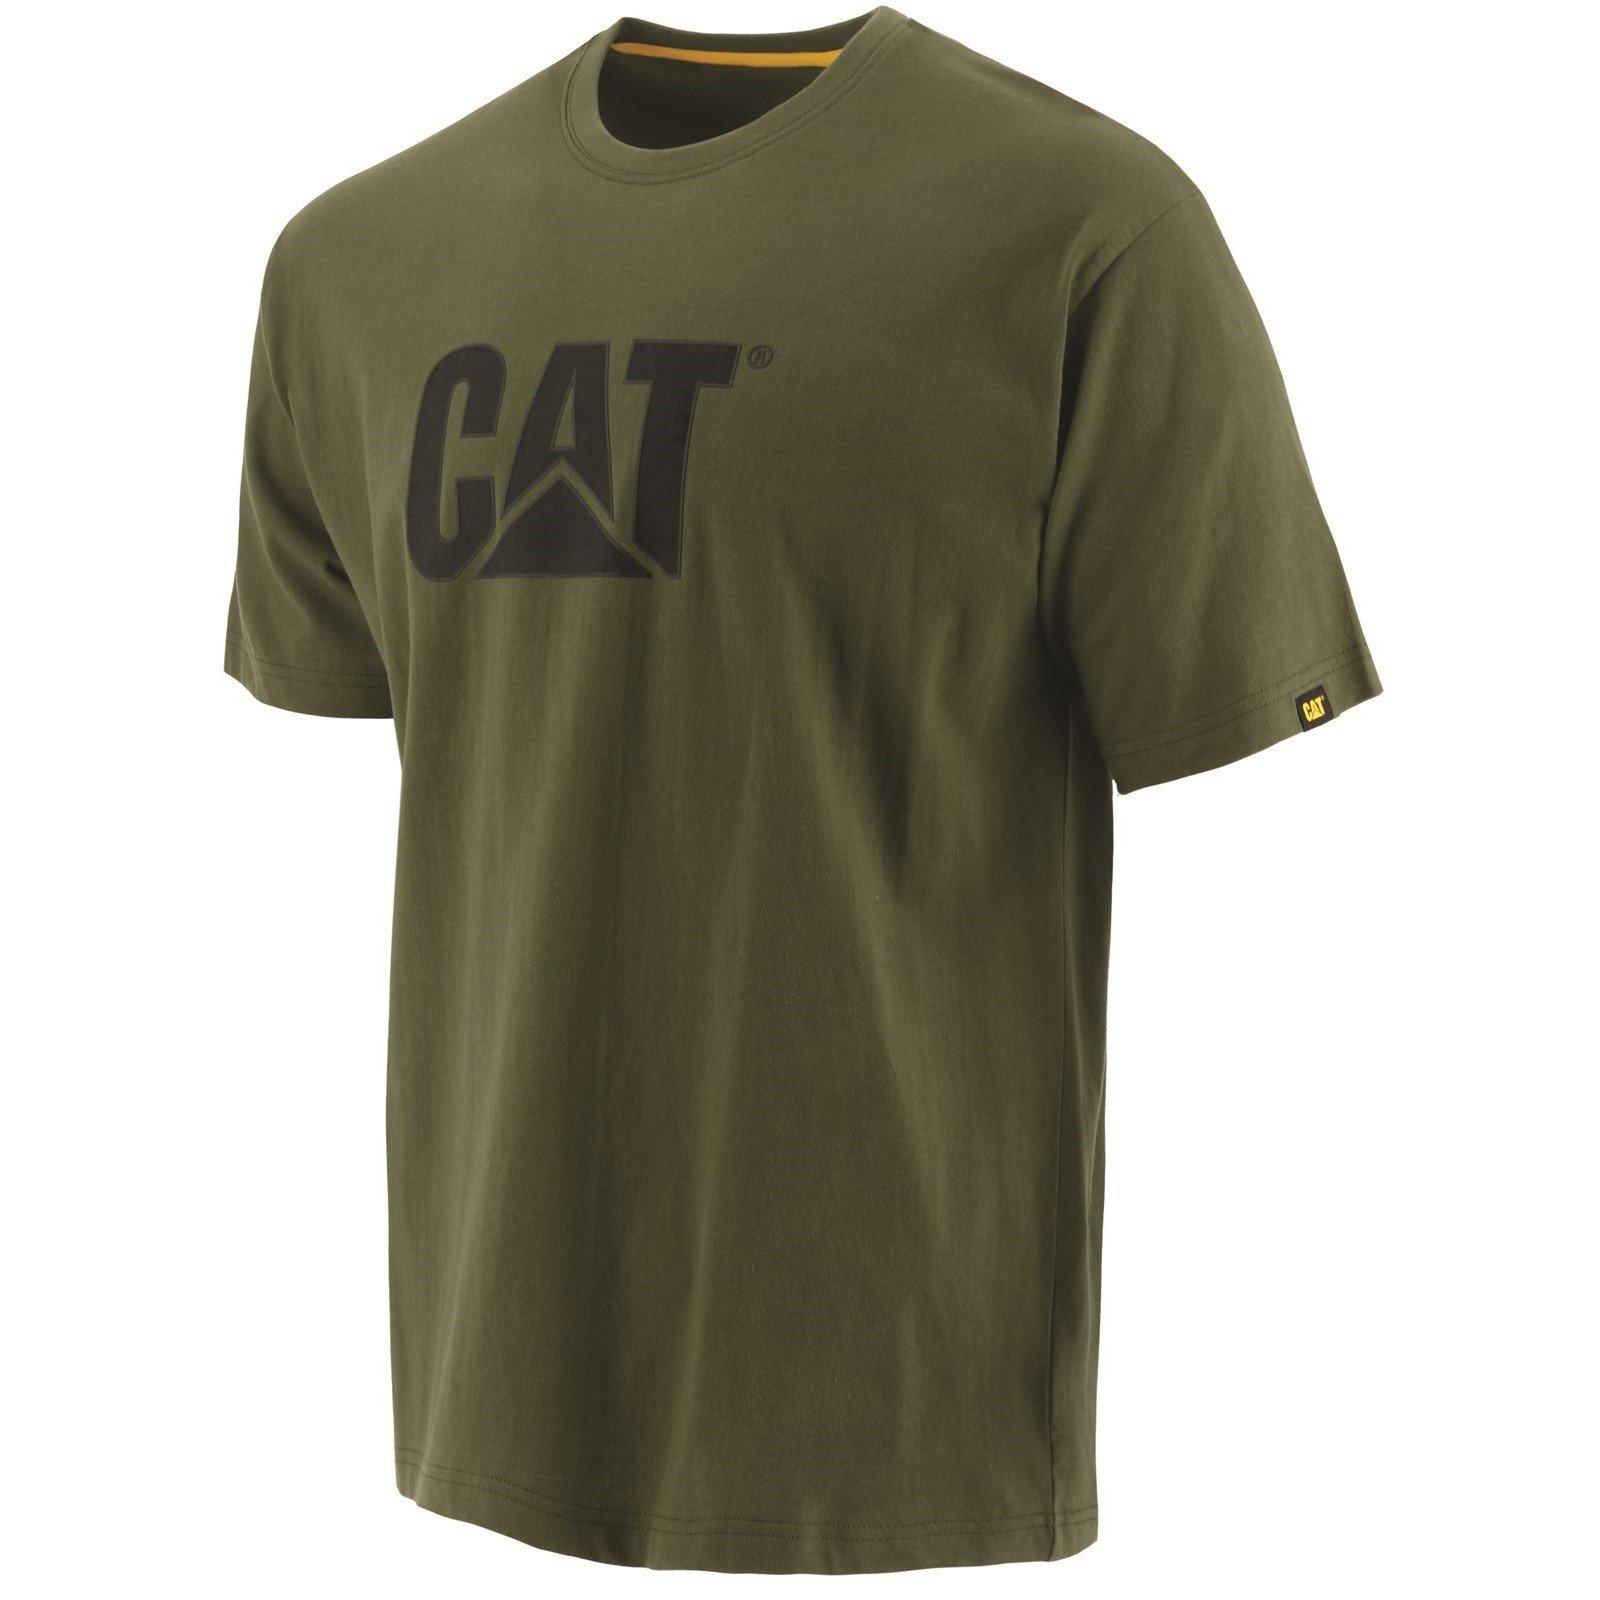 Caterpillar Men's Trademark Logo T-Shirt Various Colours 25301-42086 - Chive XX